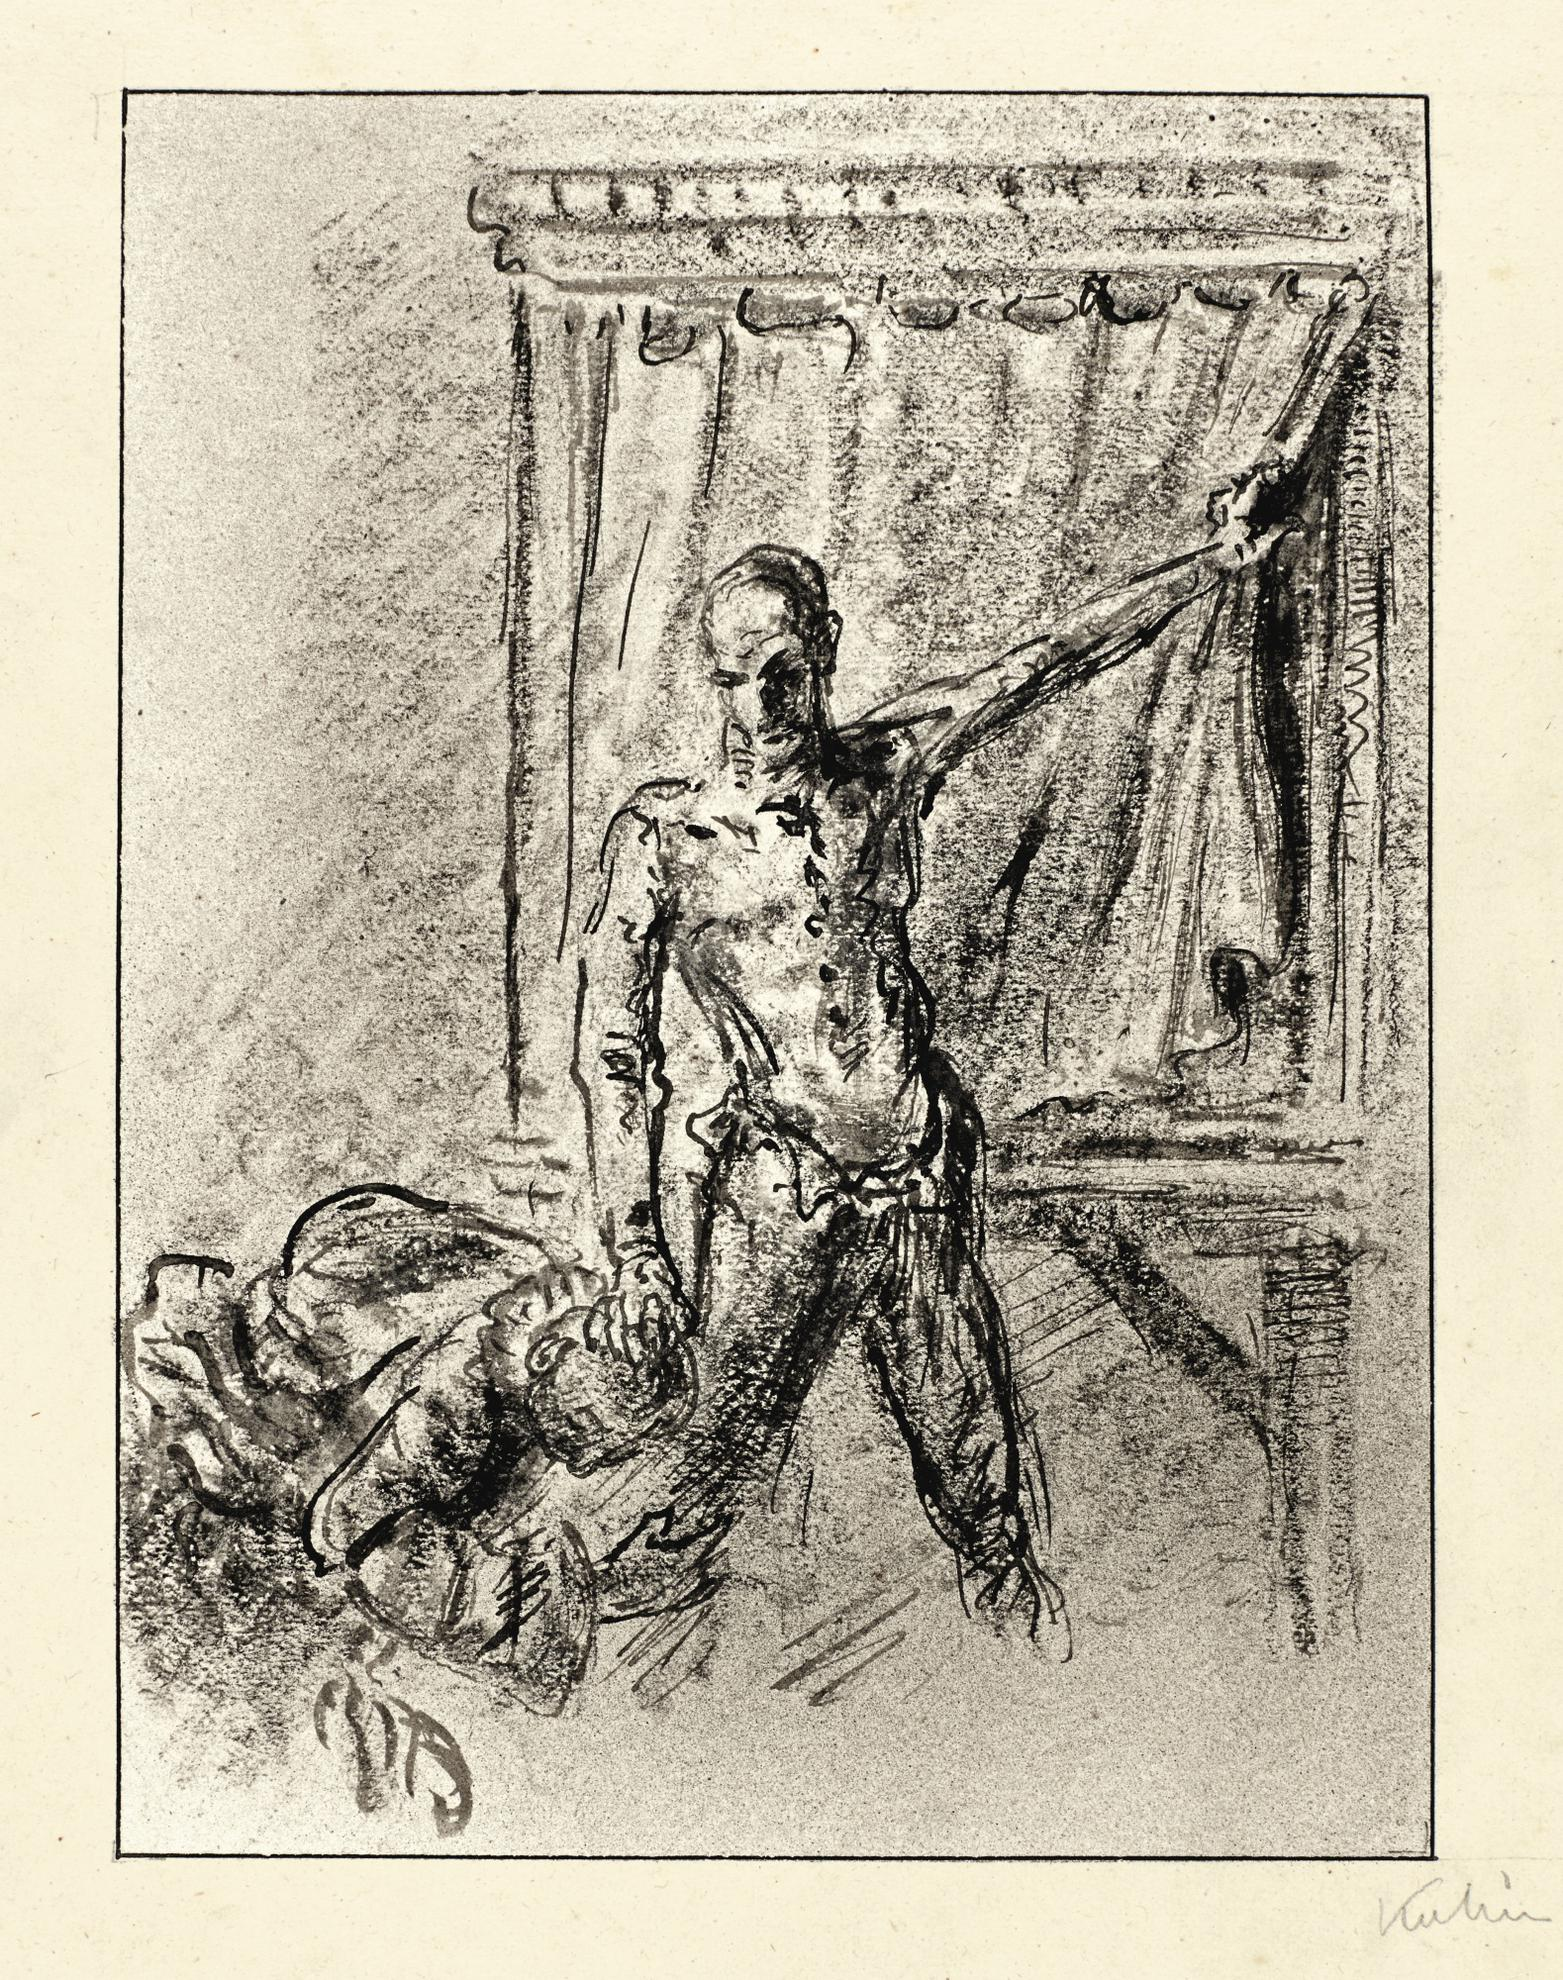 Alfred Kubin-Knechtung (Enslavement)-1911